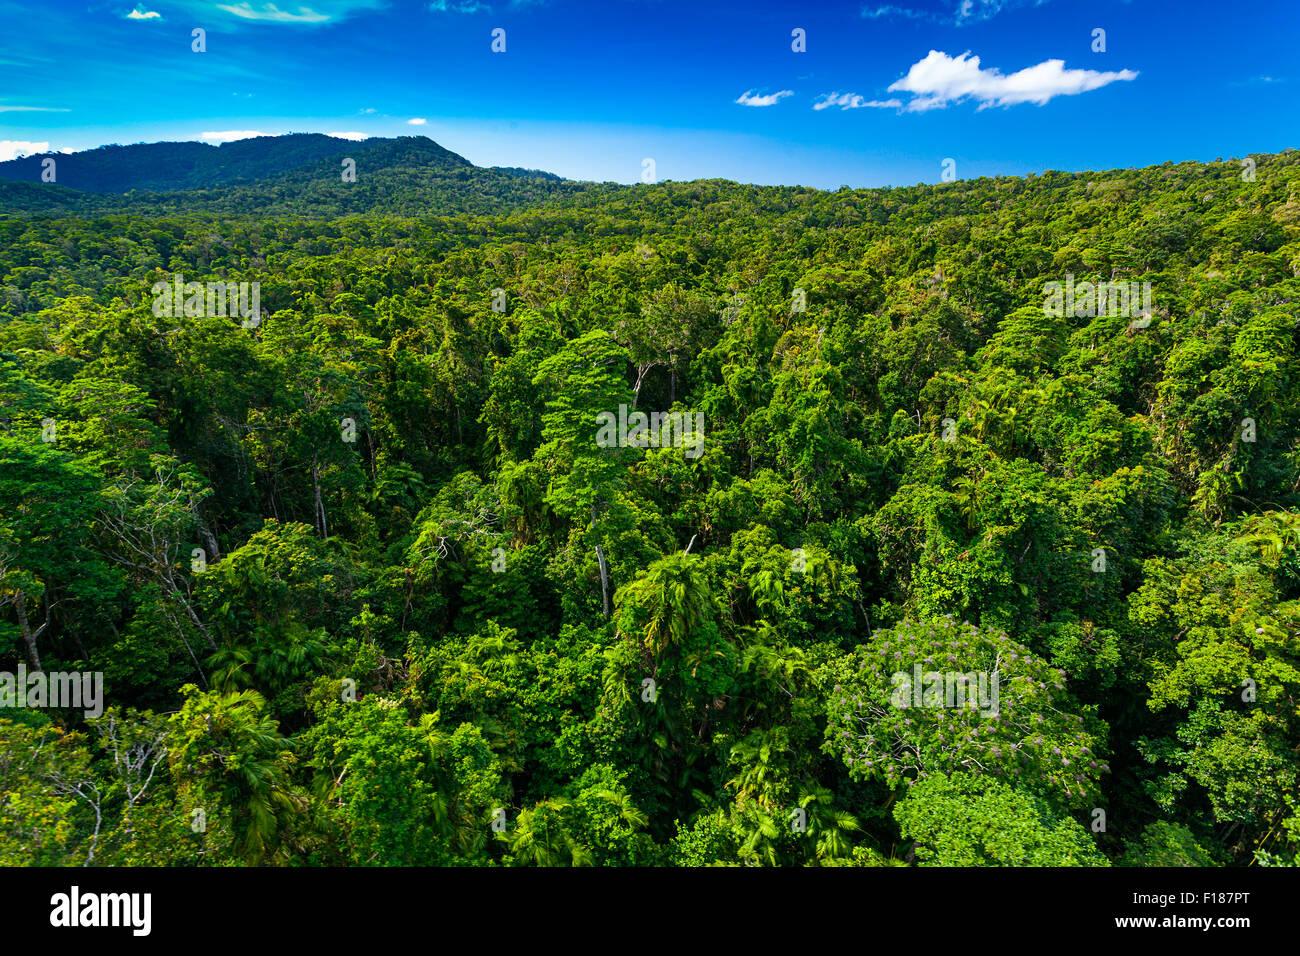 Rain forest from air near Kuranda, North Queensland, Australia - Stock Image